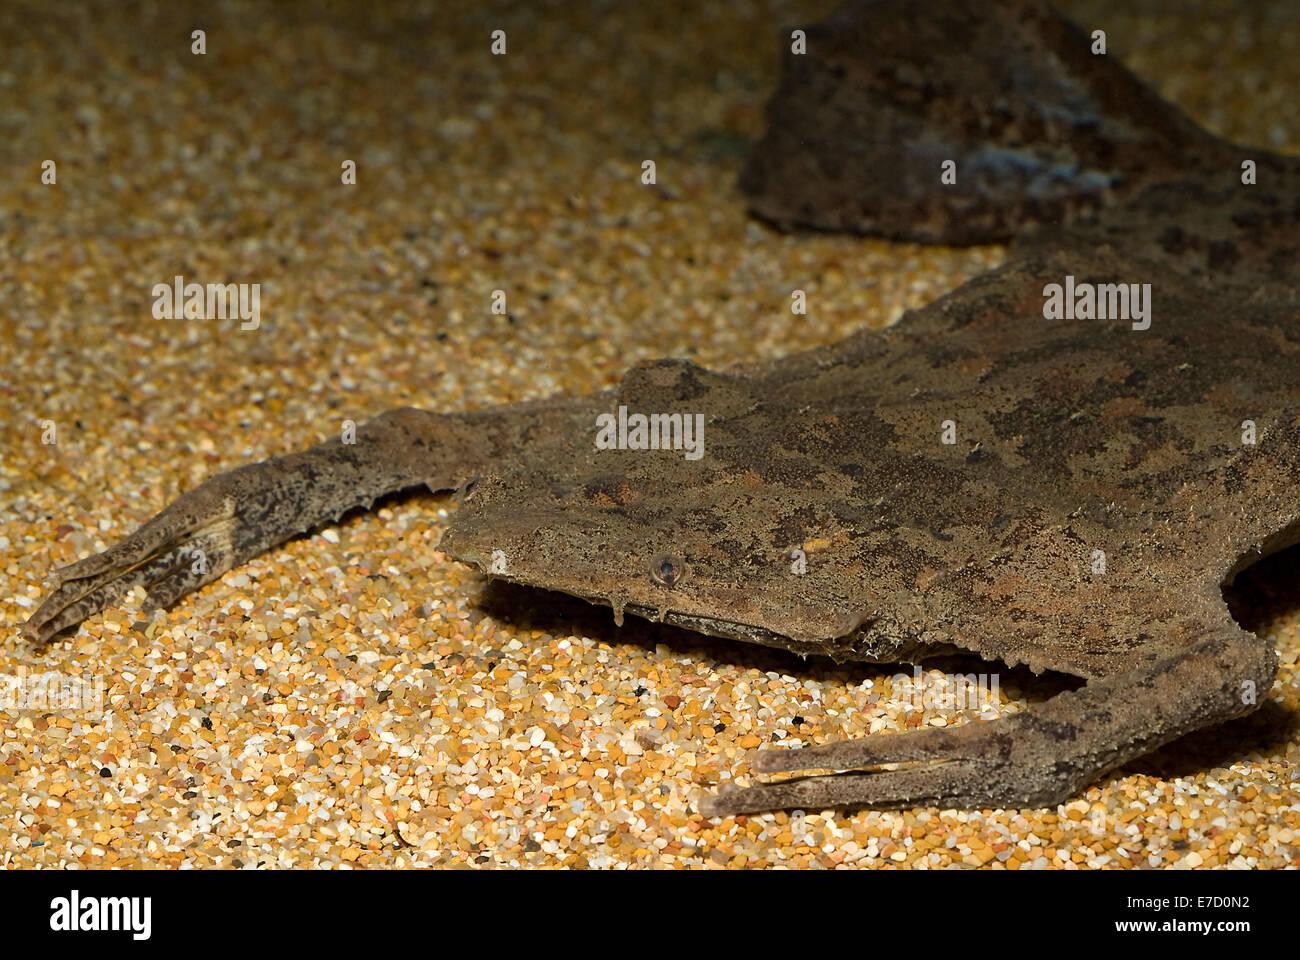 Common Suriname toad, Pipa pipa, Pipidae, South America - Stock Image